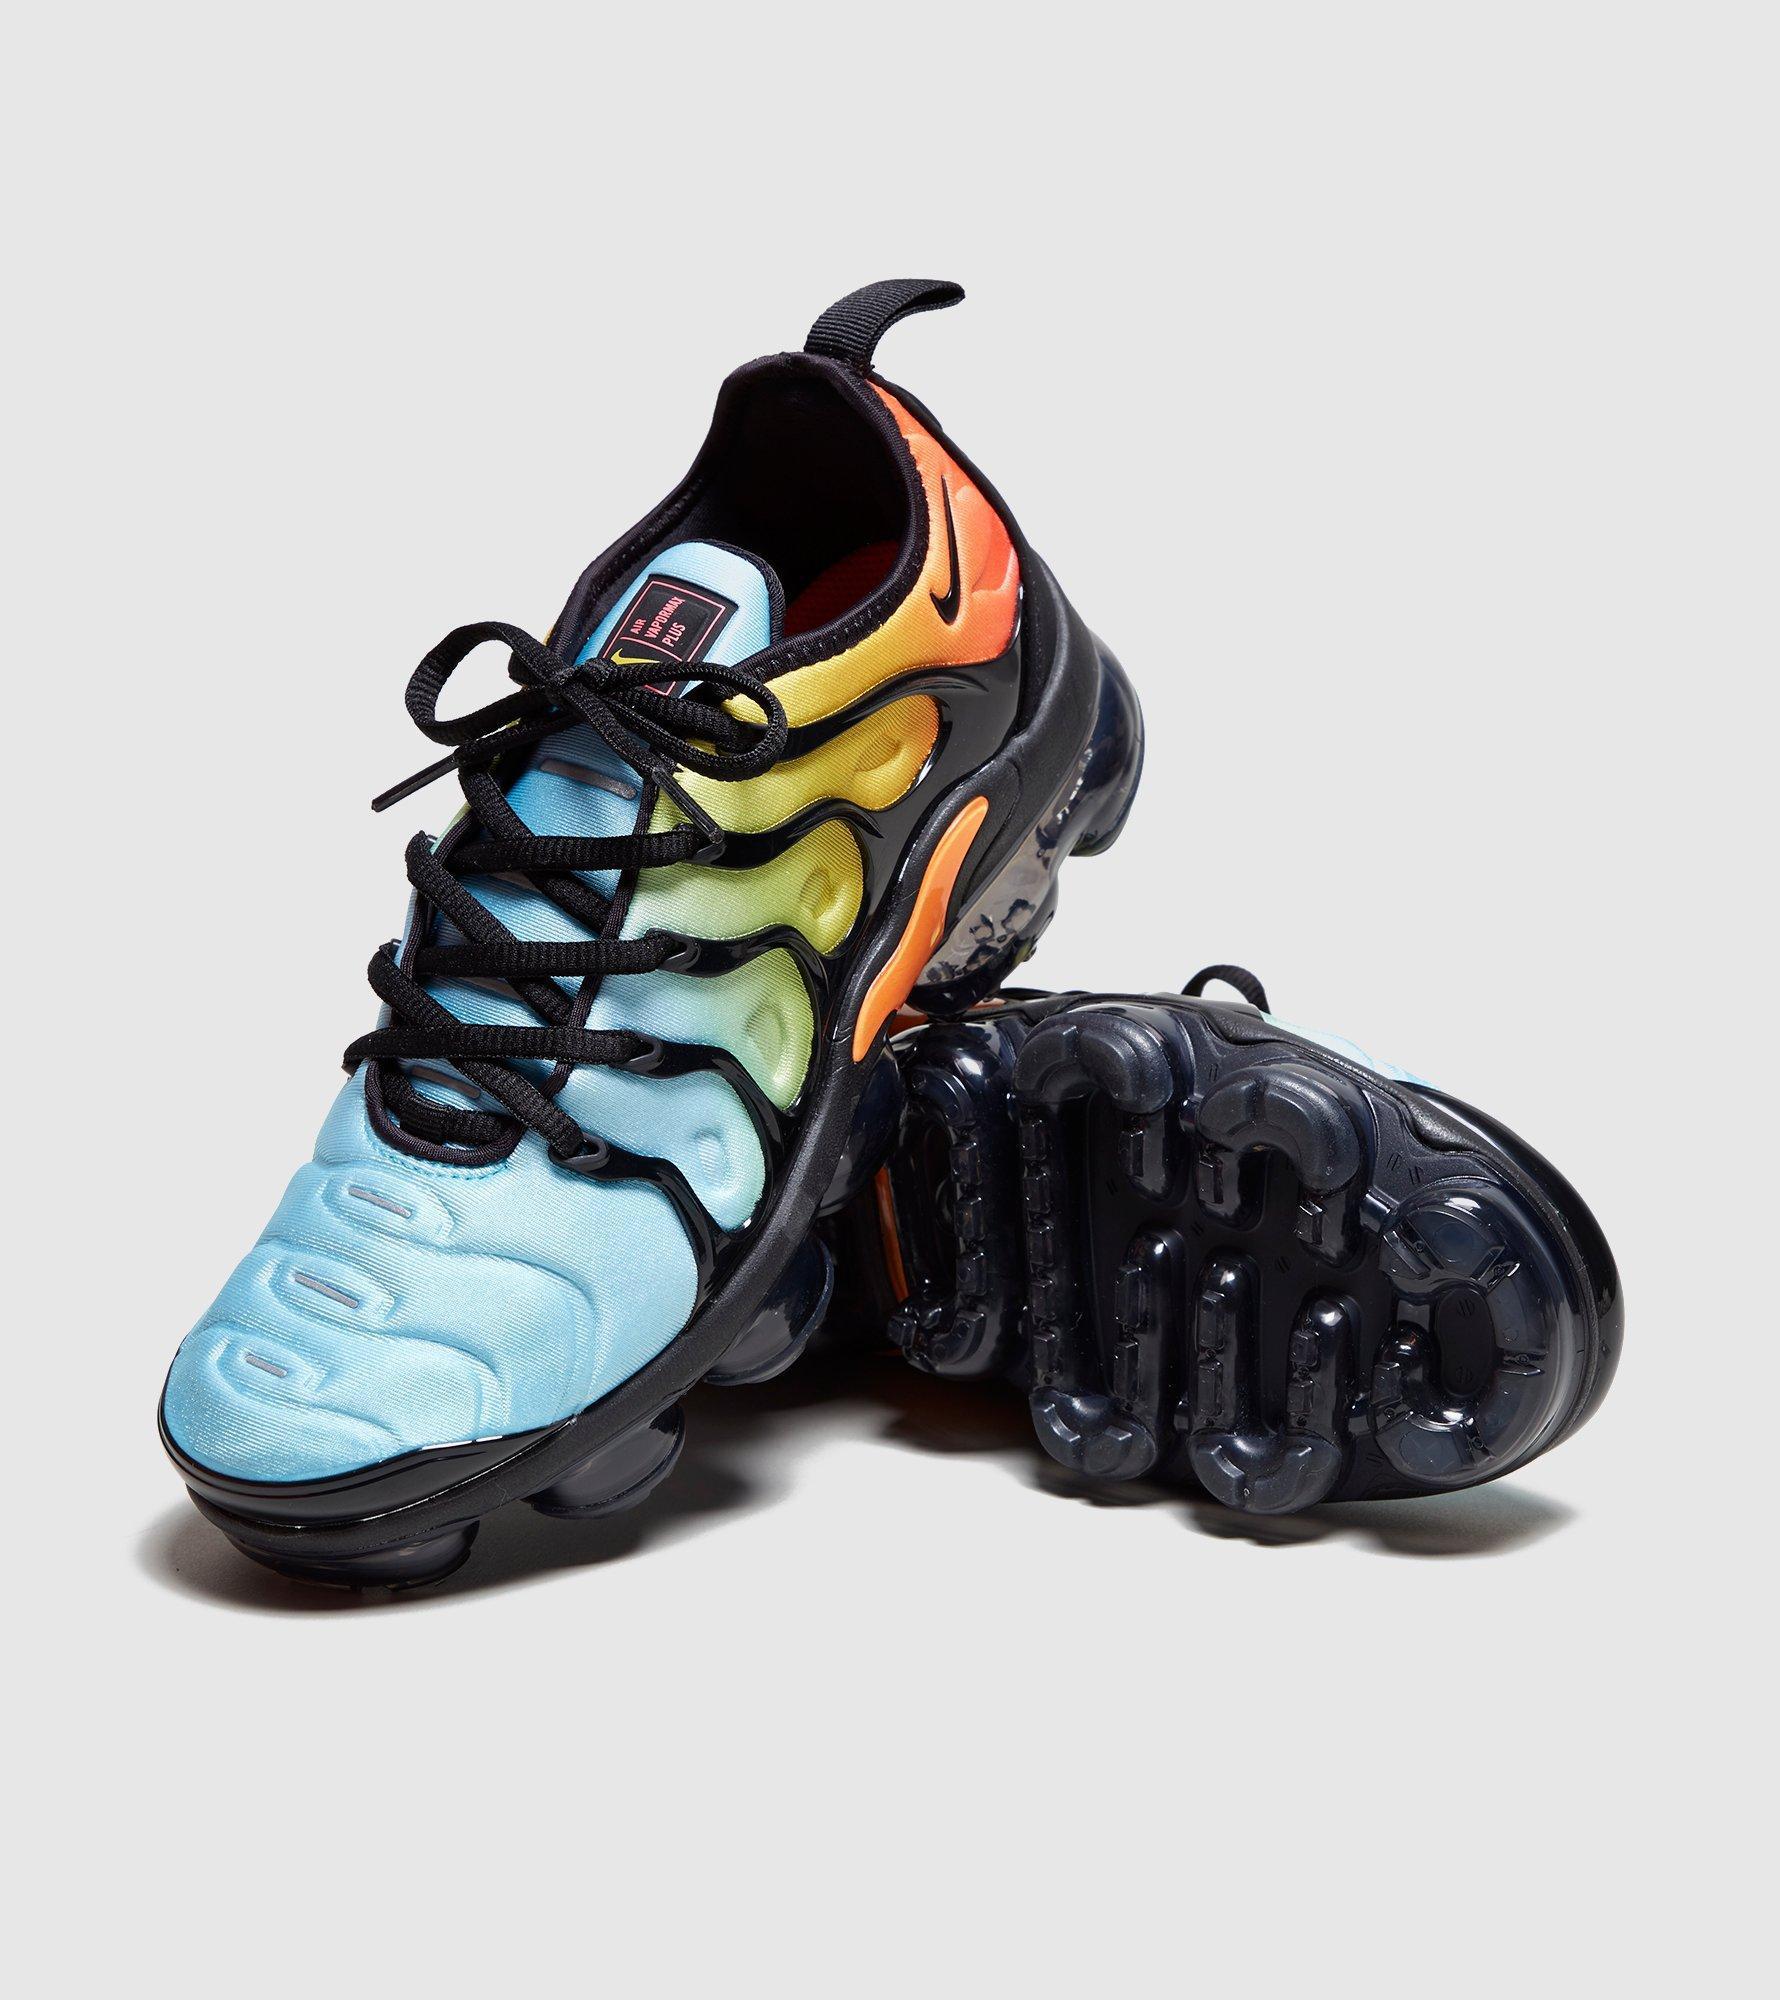 6e0d7ce038 Nike Air Vapormax Plus Women's in Black - Lyst